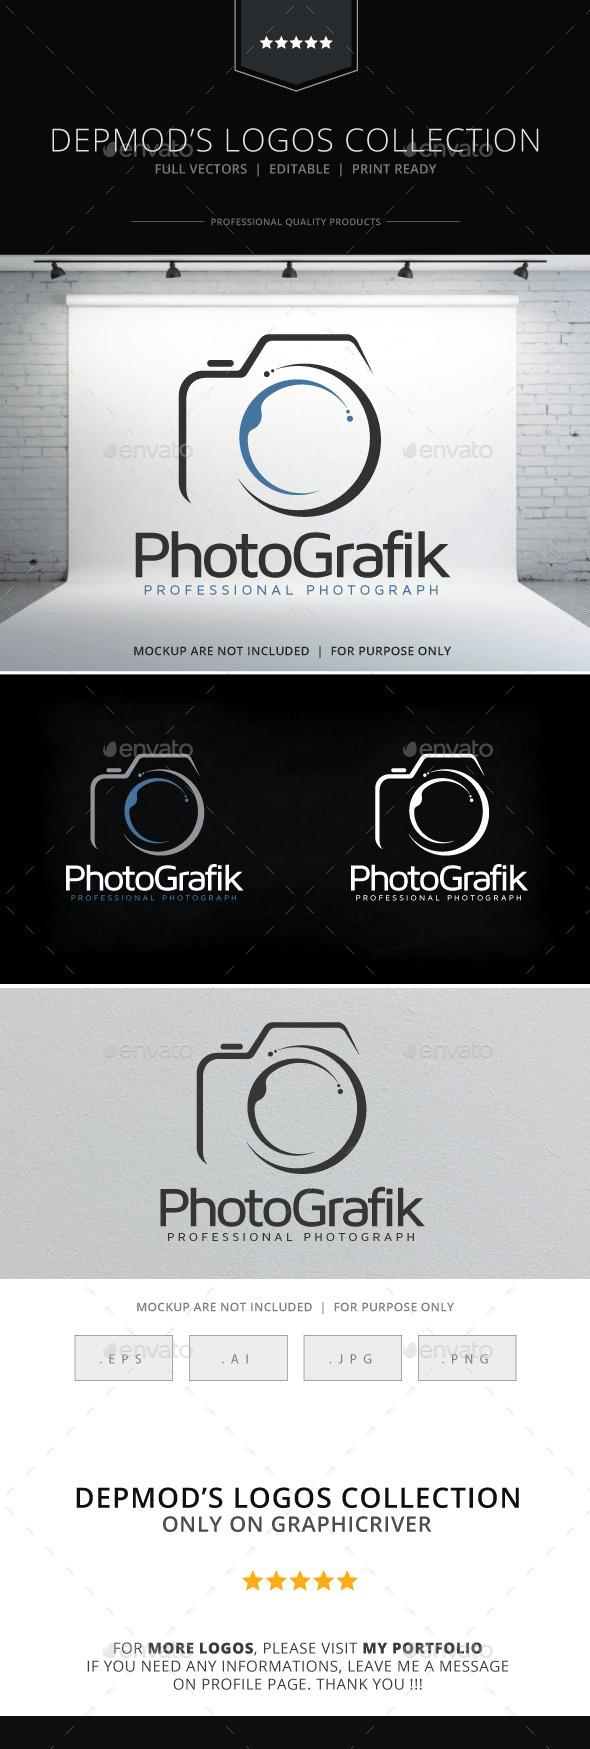 Photografik Logo